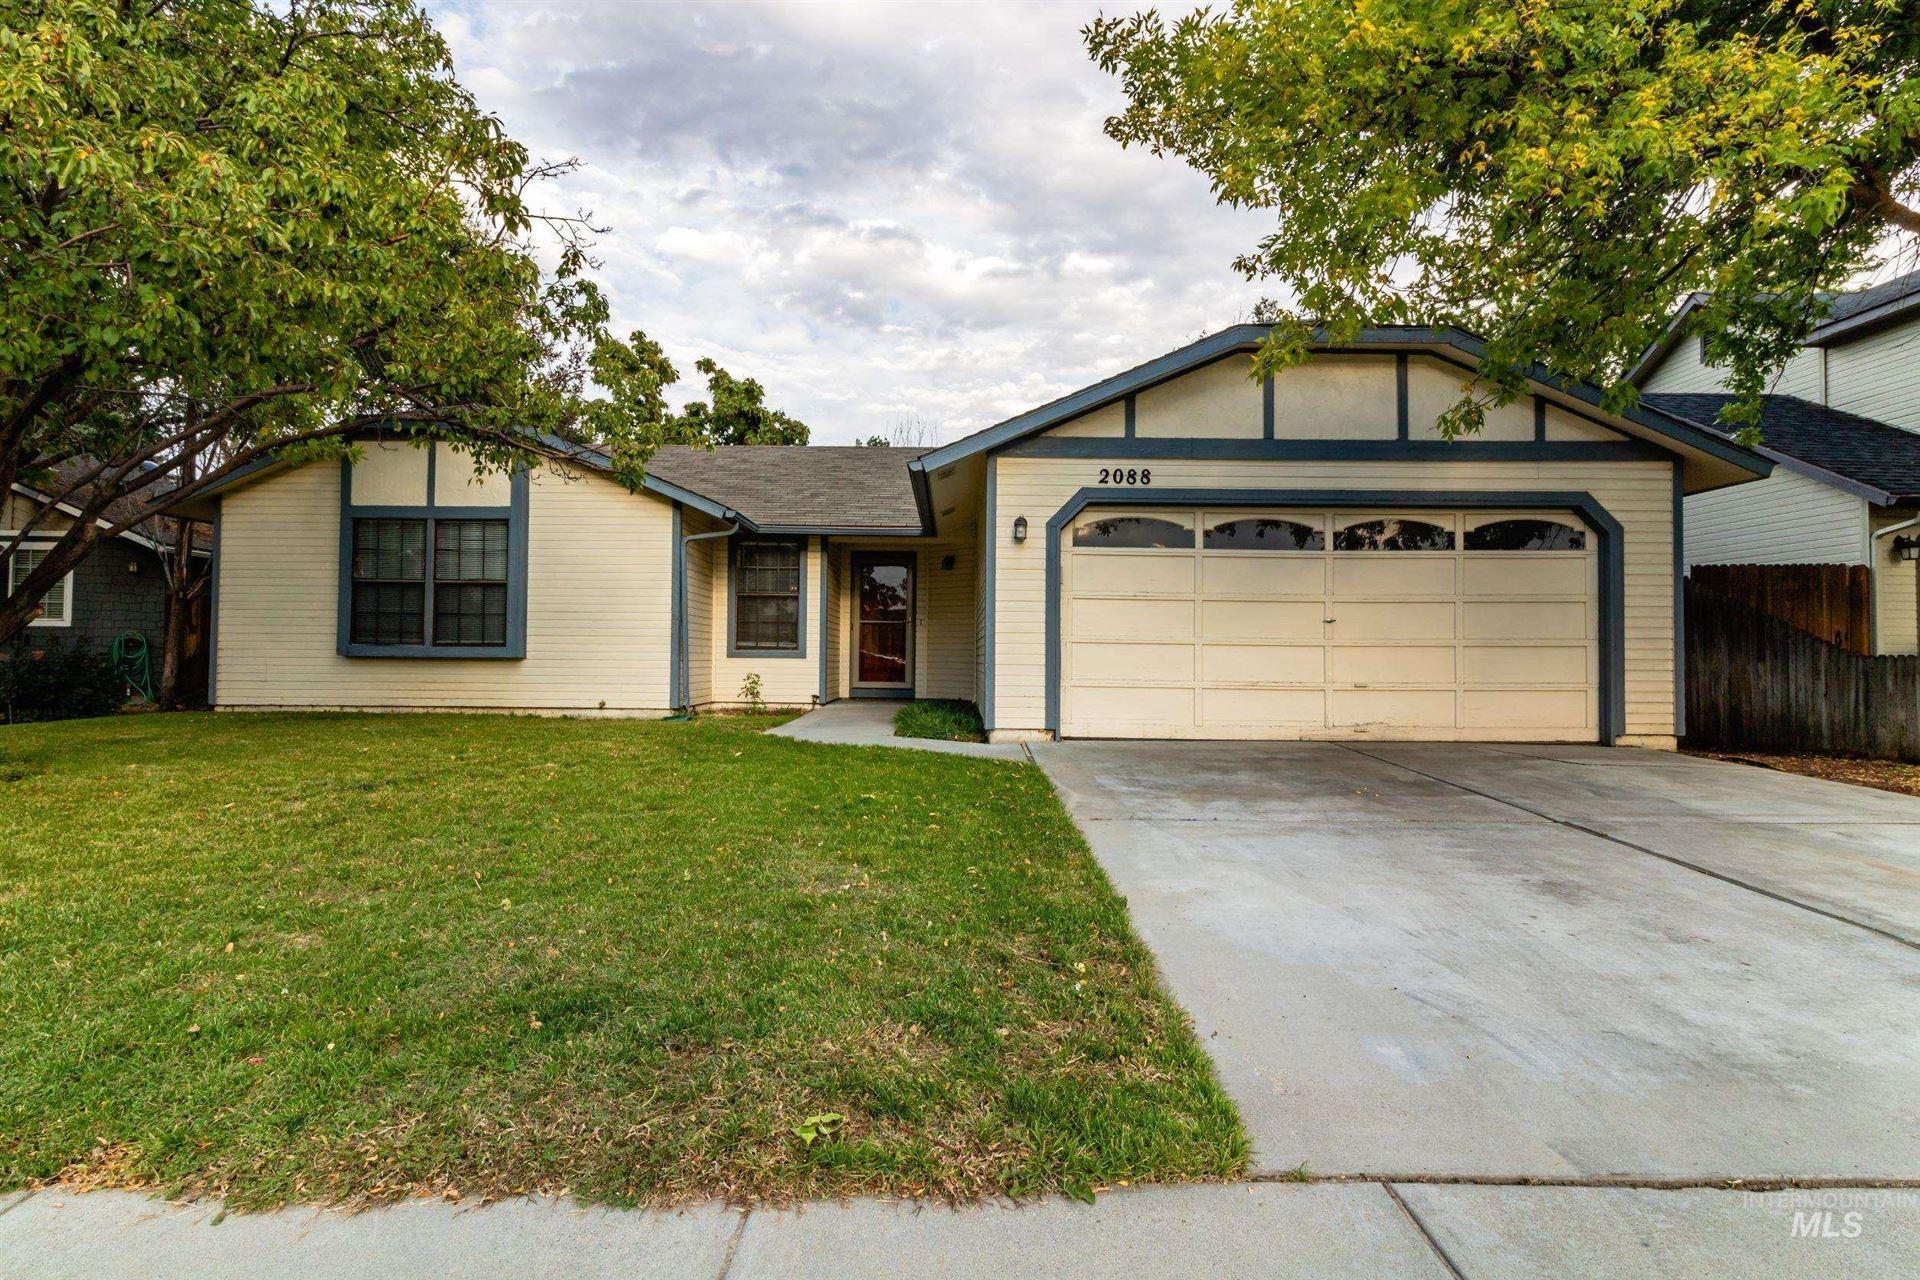 2088 N Currant Pl, Boise, ID 83704-6884 - MLS#: 98821171